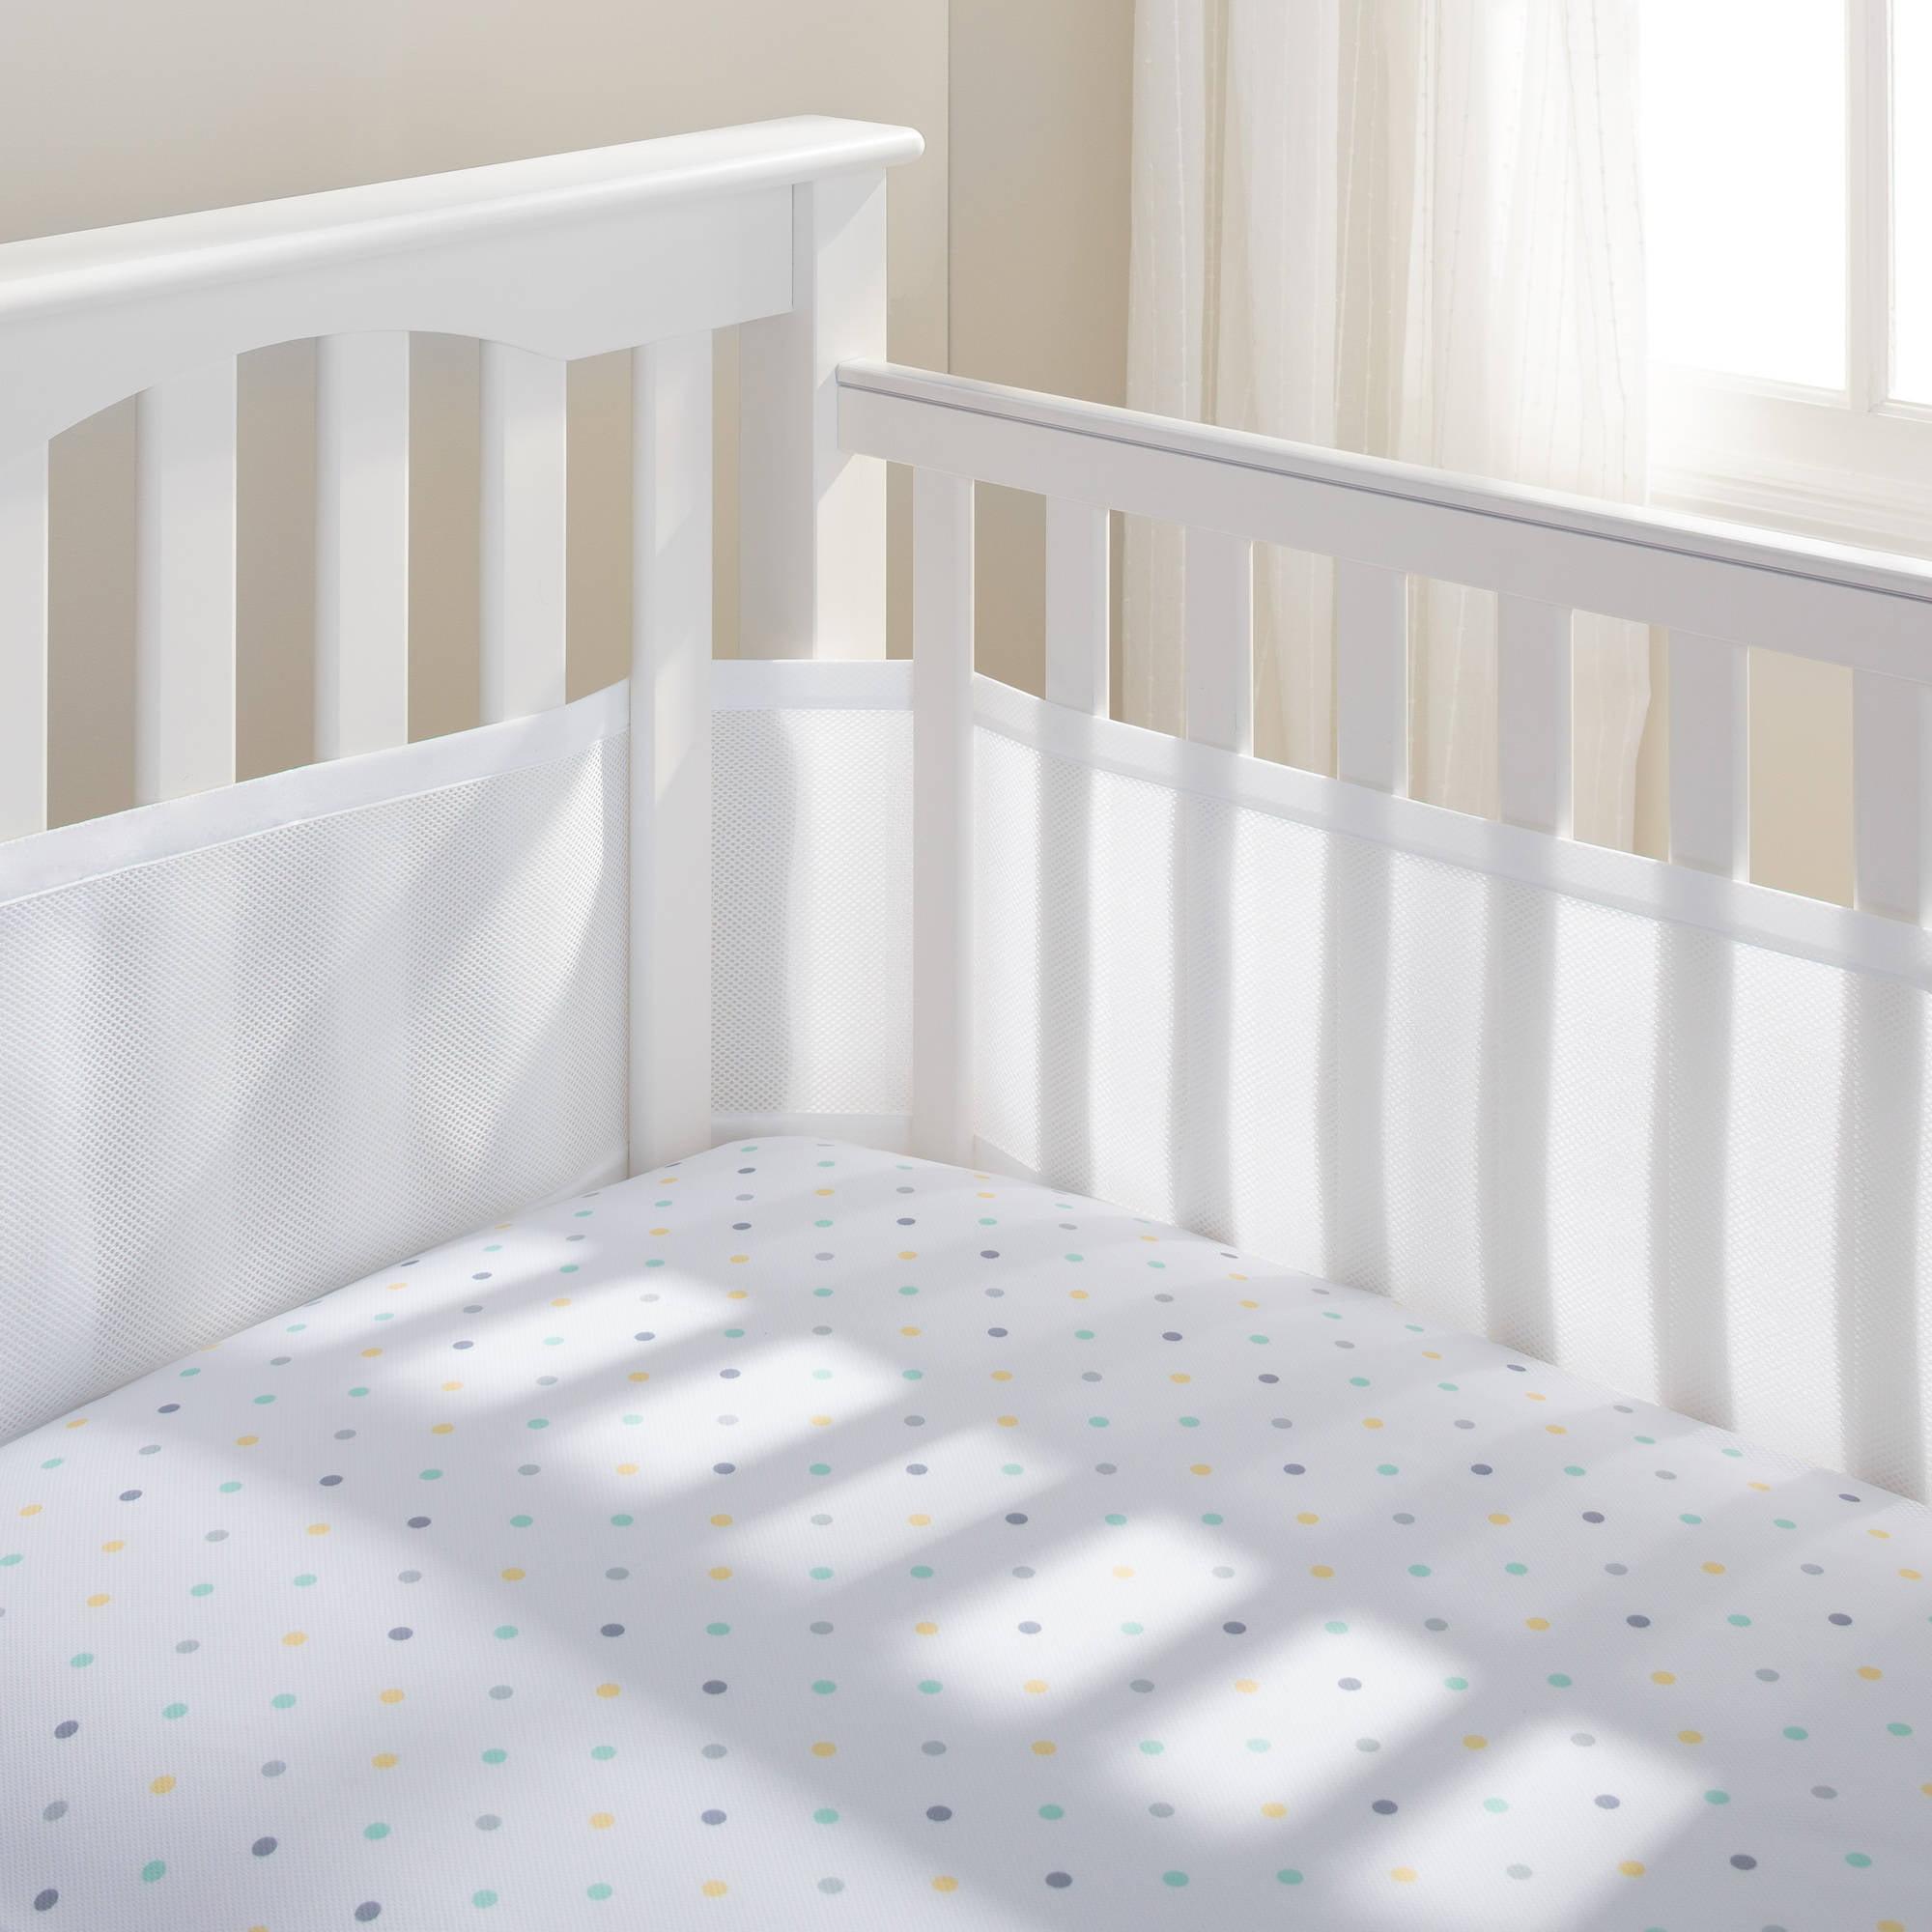 BreathableBaby Mesh Crib Liner, White